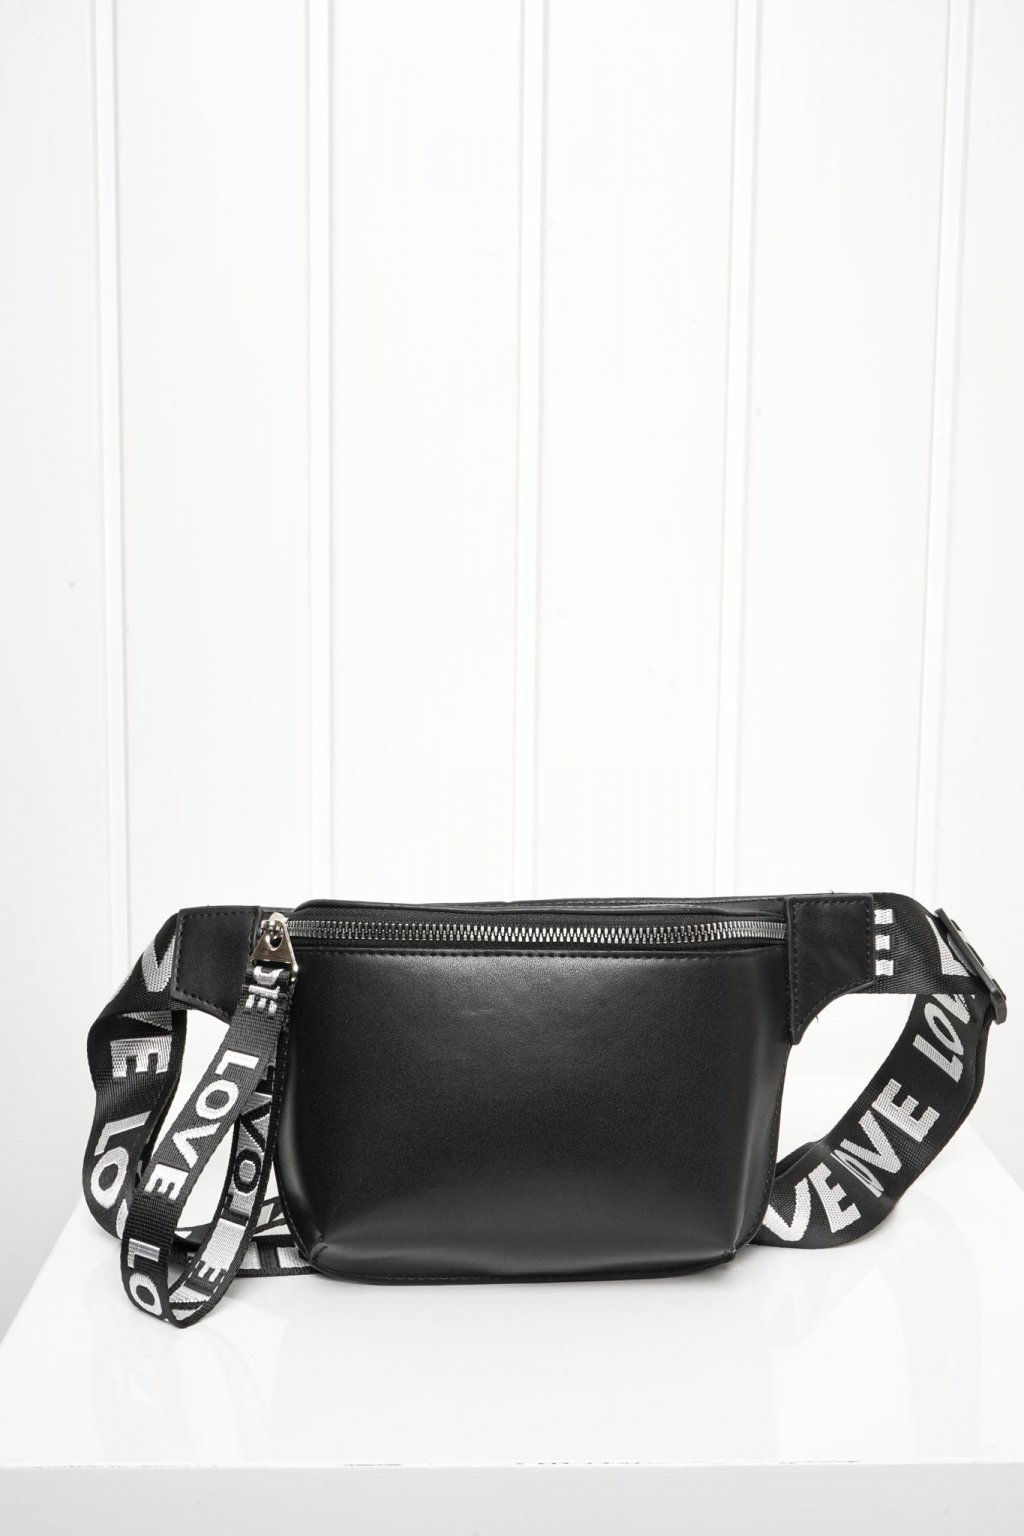 Kabelka, crossbody, ruksak, shopping bag, shopperka, 631